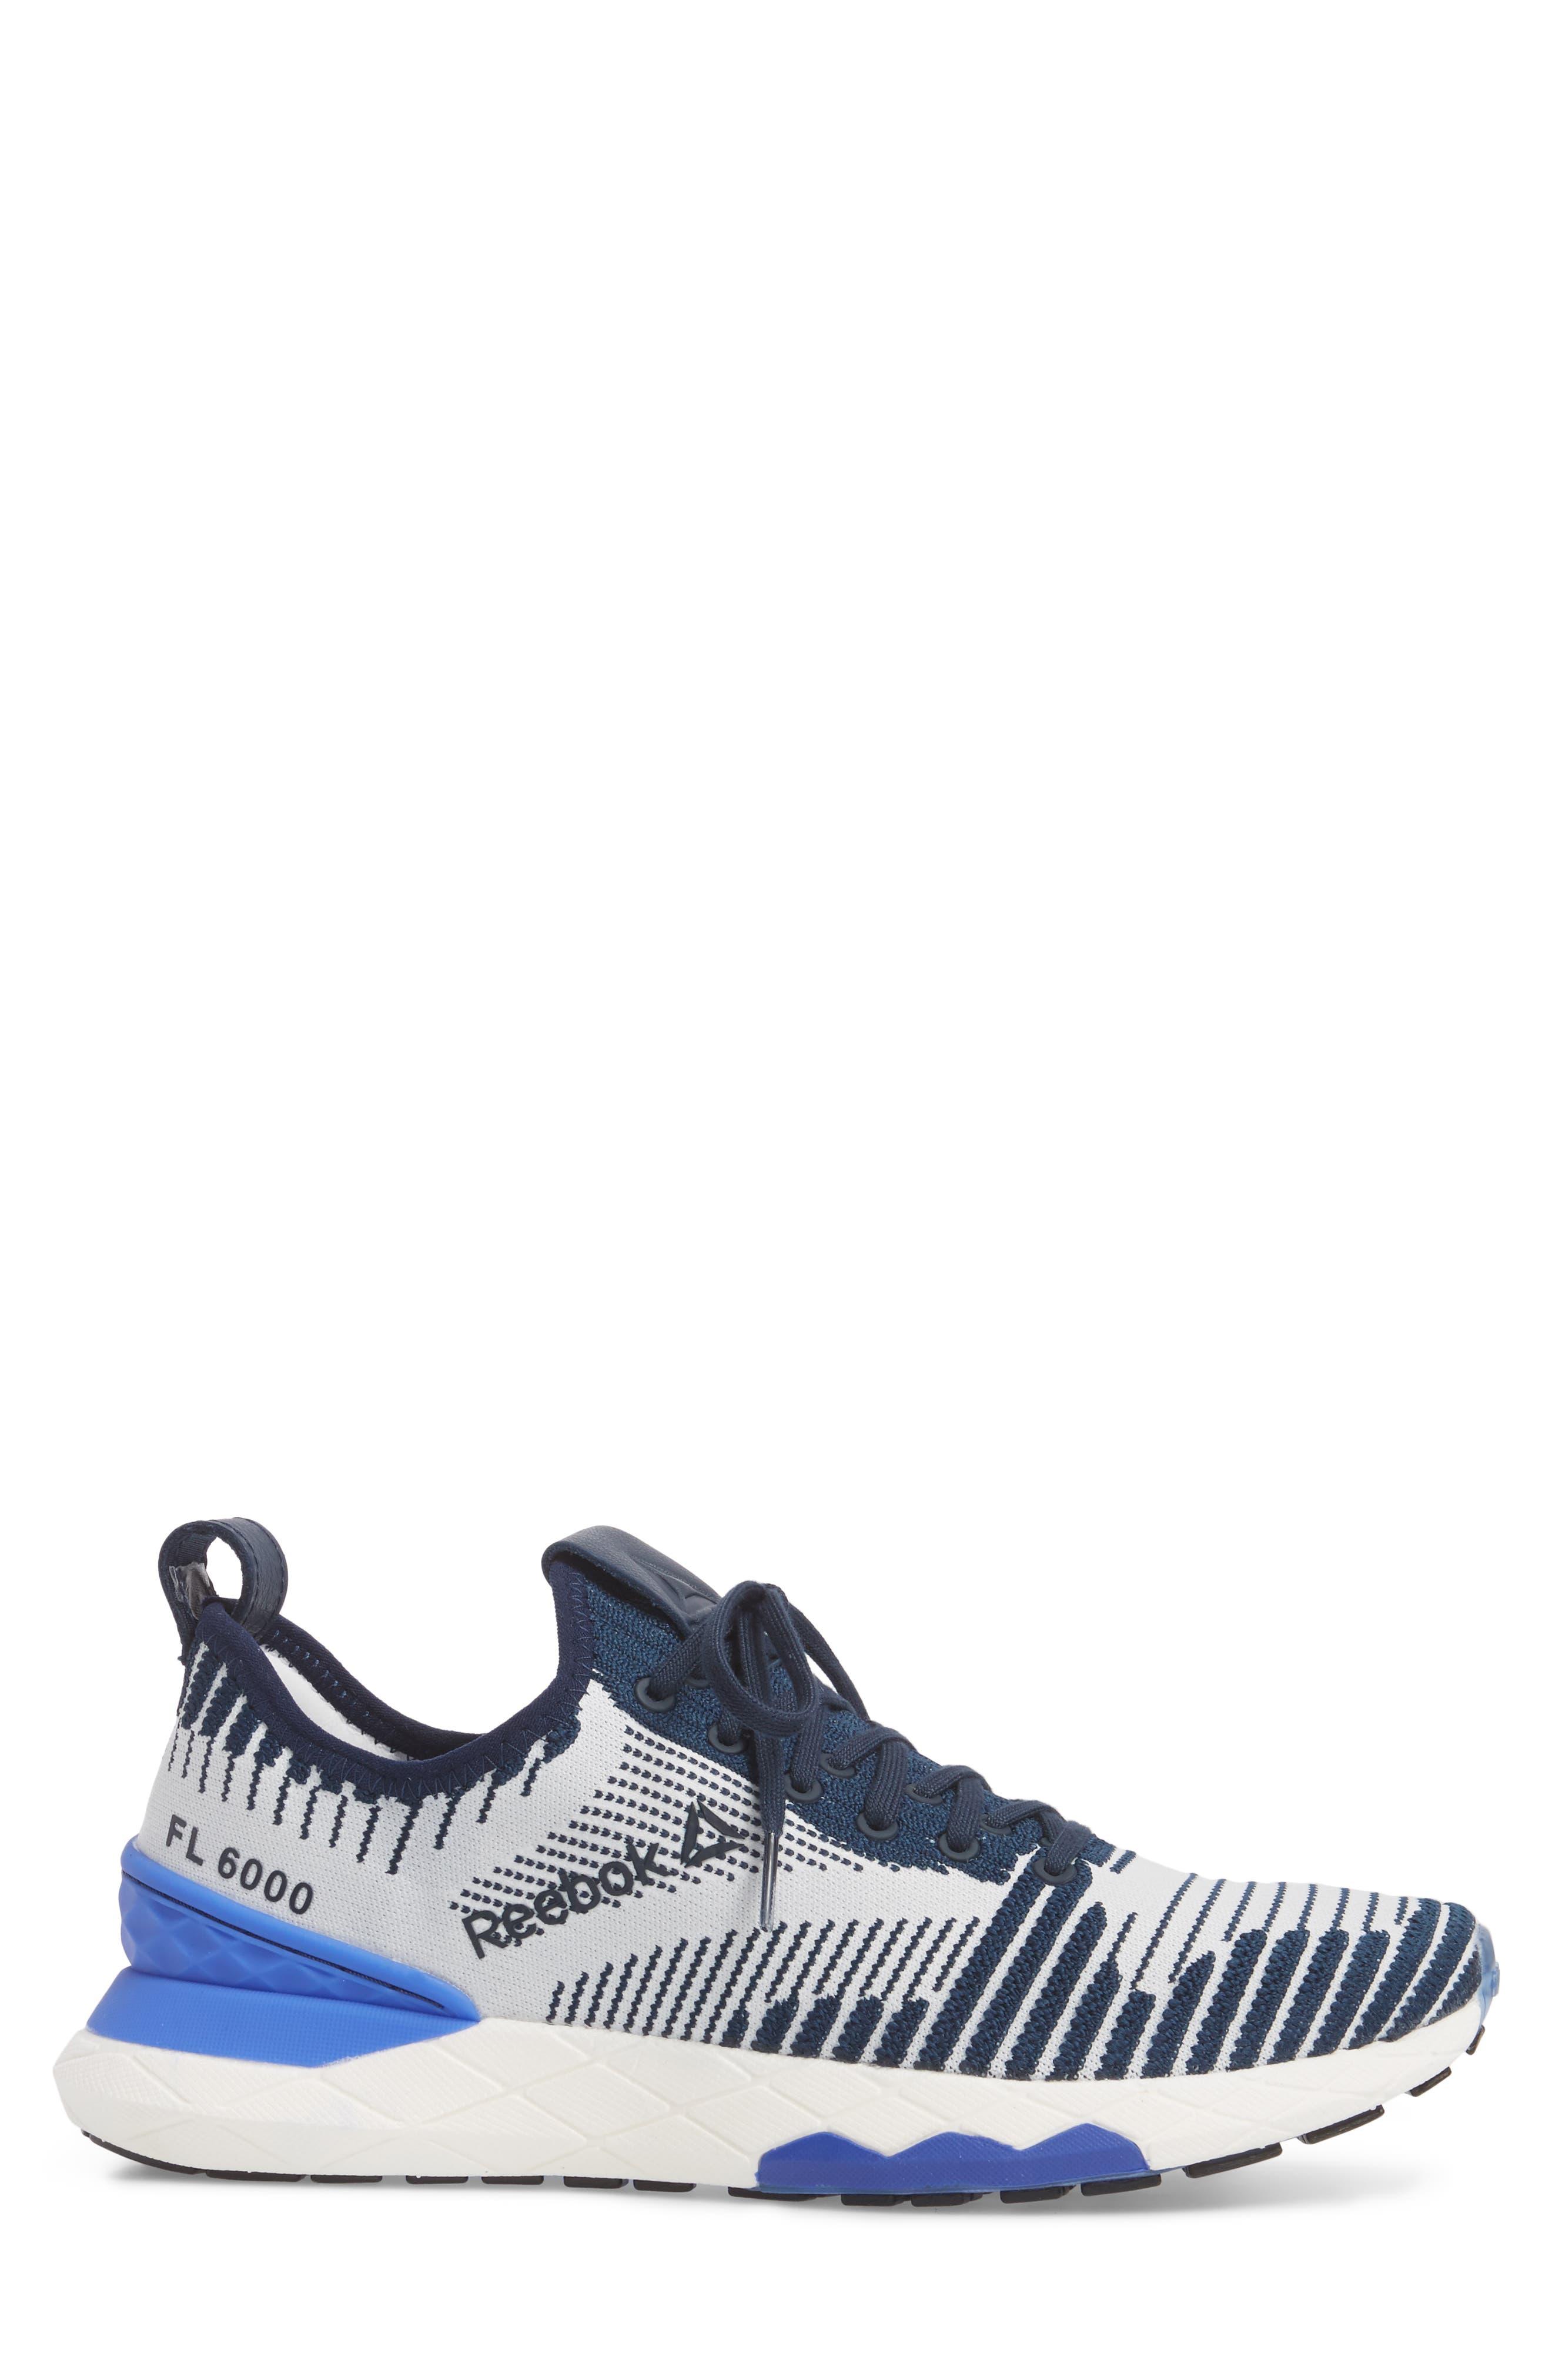 Floatride Run 6000 Running Shoe,                             Alternate thumbnail 18, color,